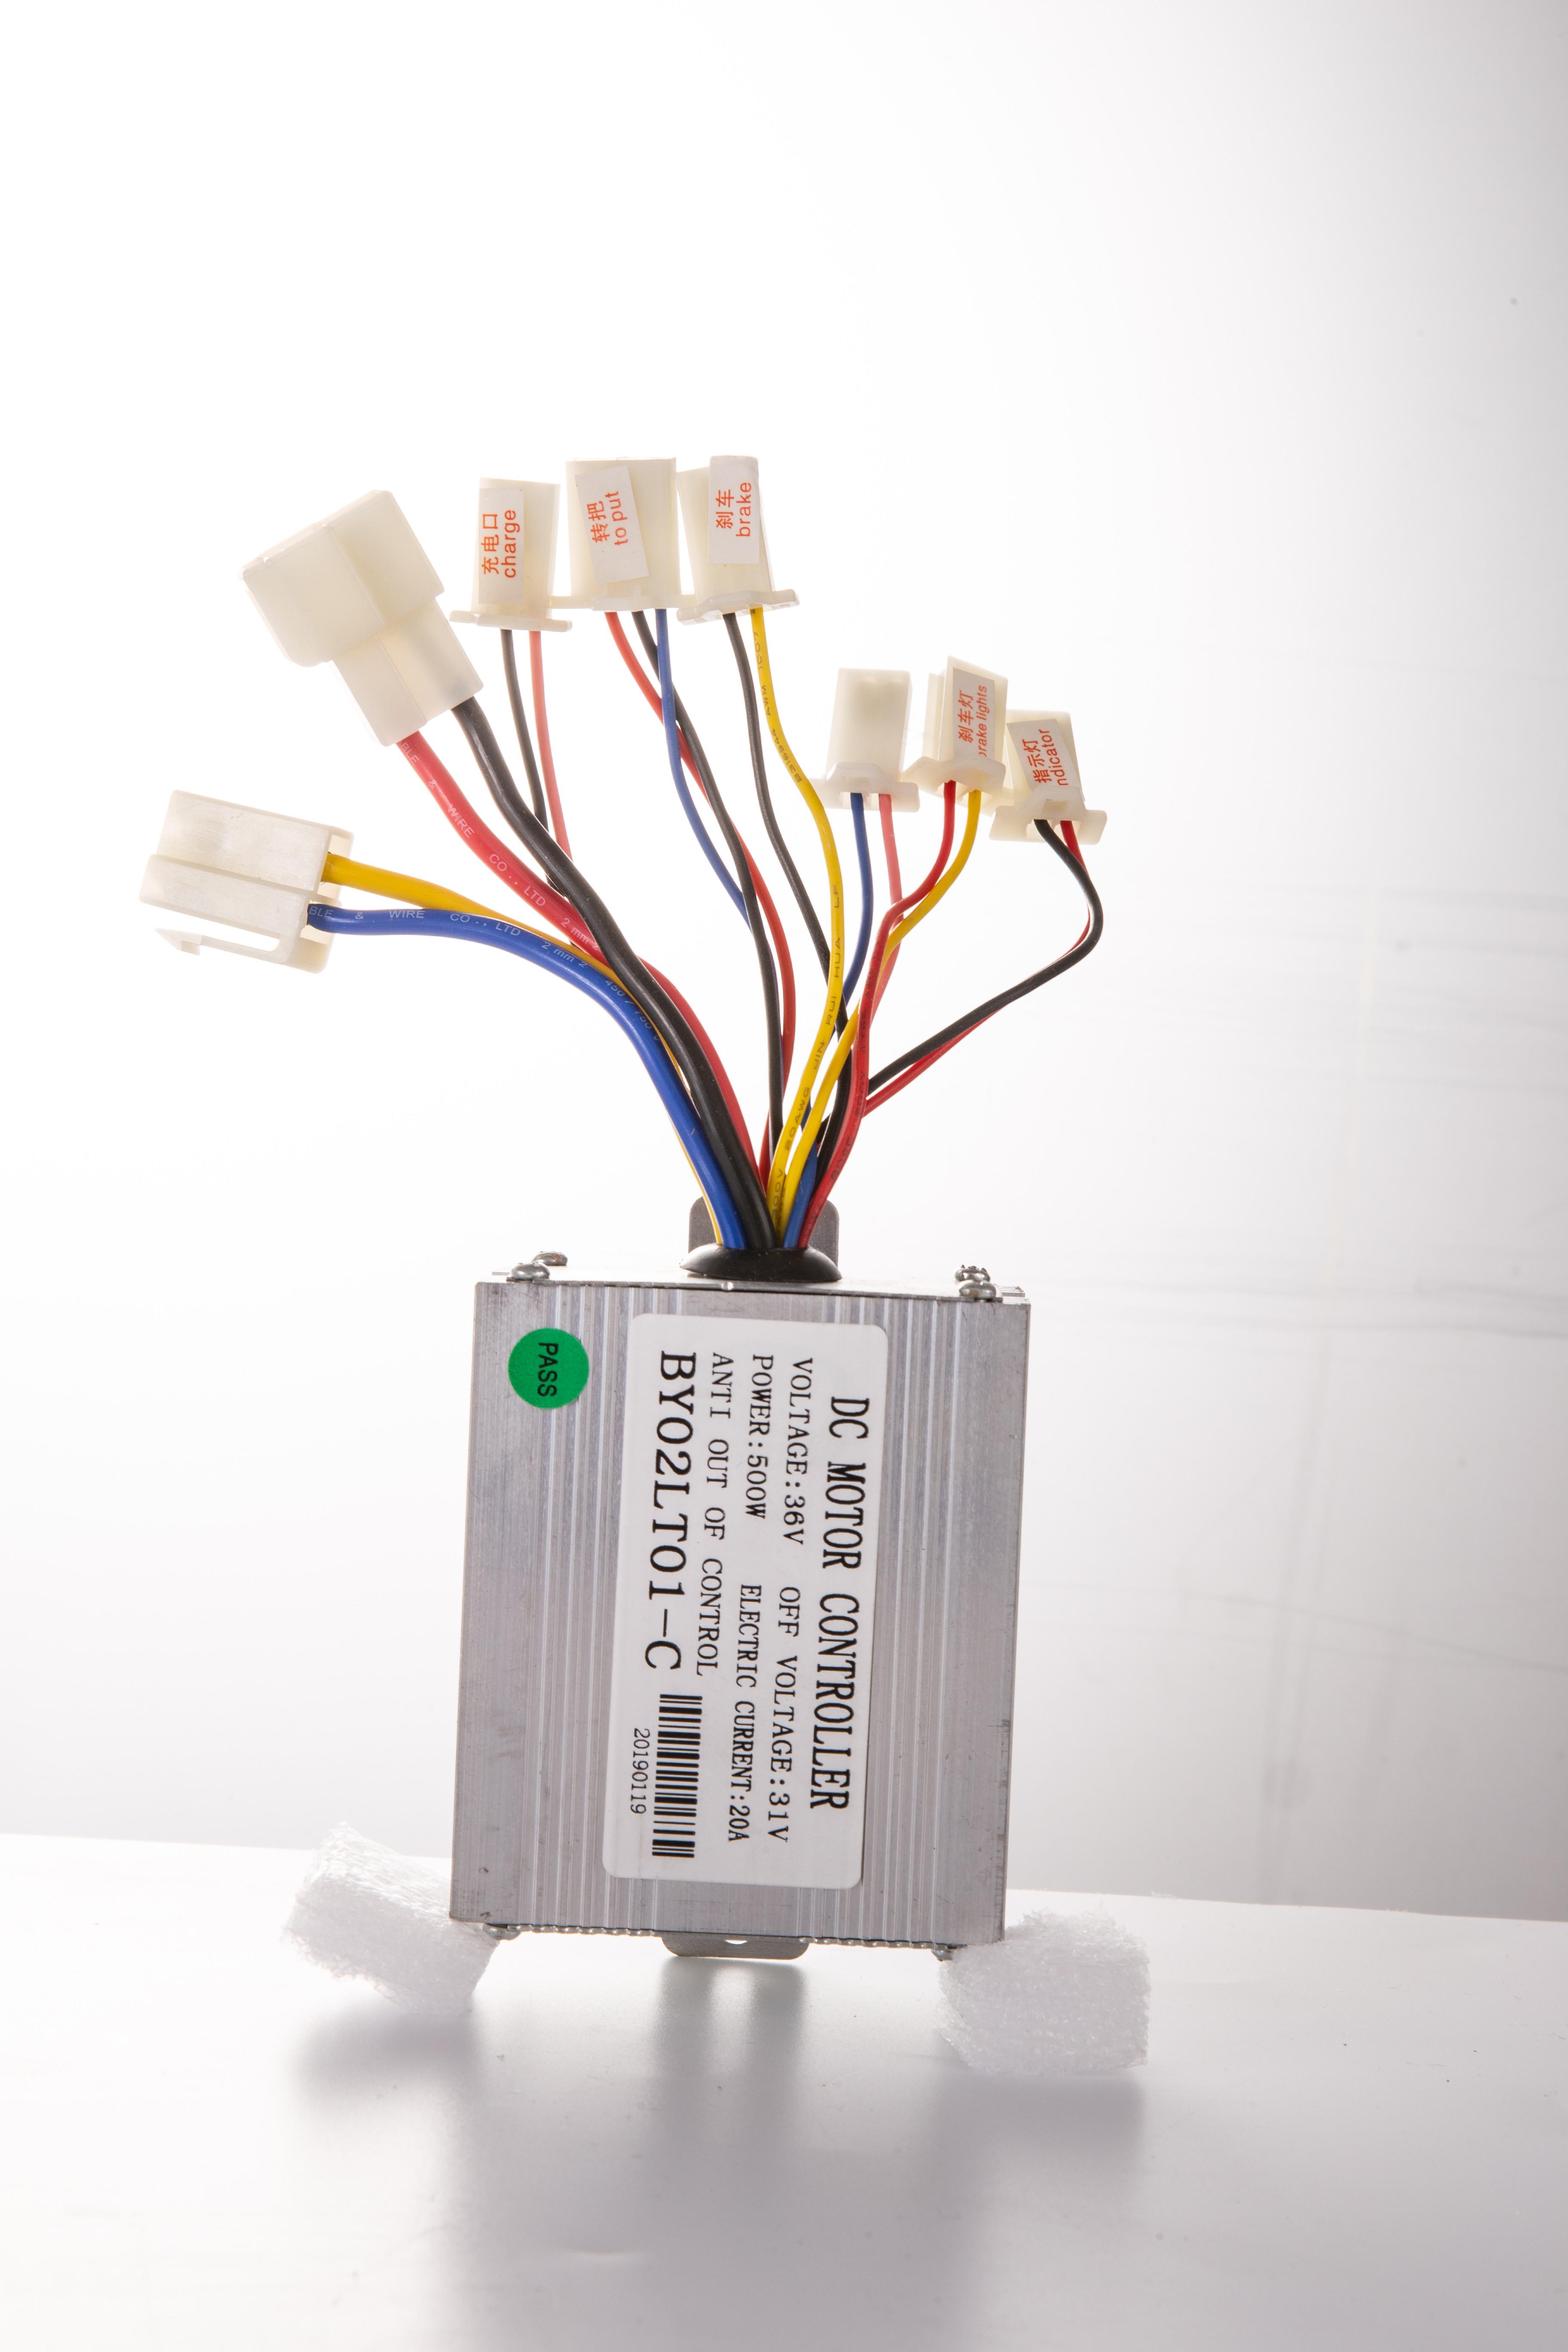 36v-Electric-Motor-controller-throttle-kit-f-Scooter-E-Scooter-ATV-Permanent thumbnail 47